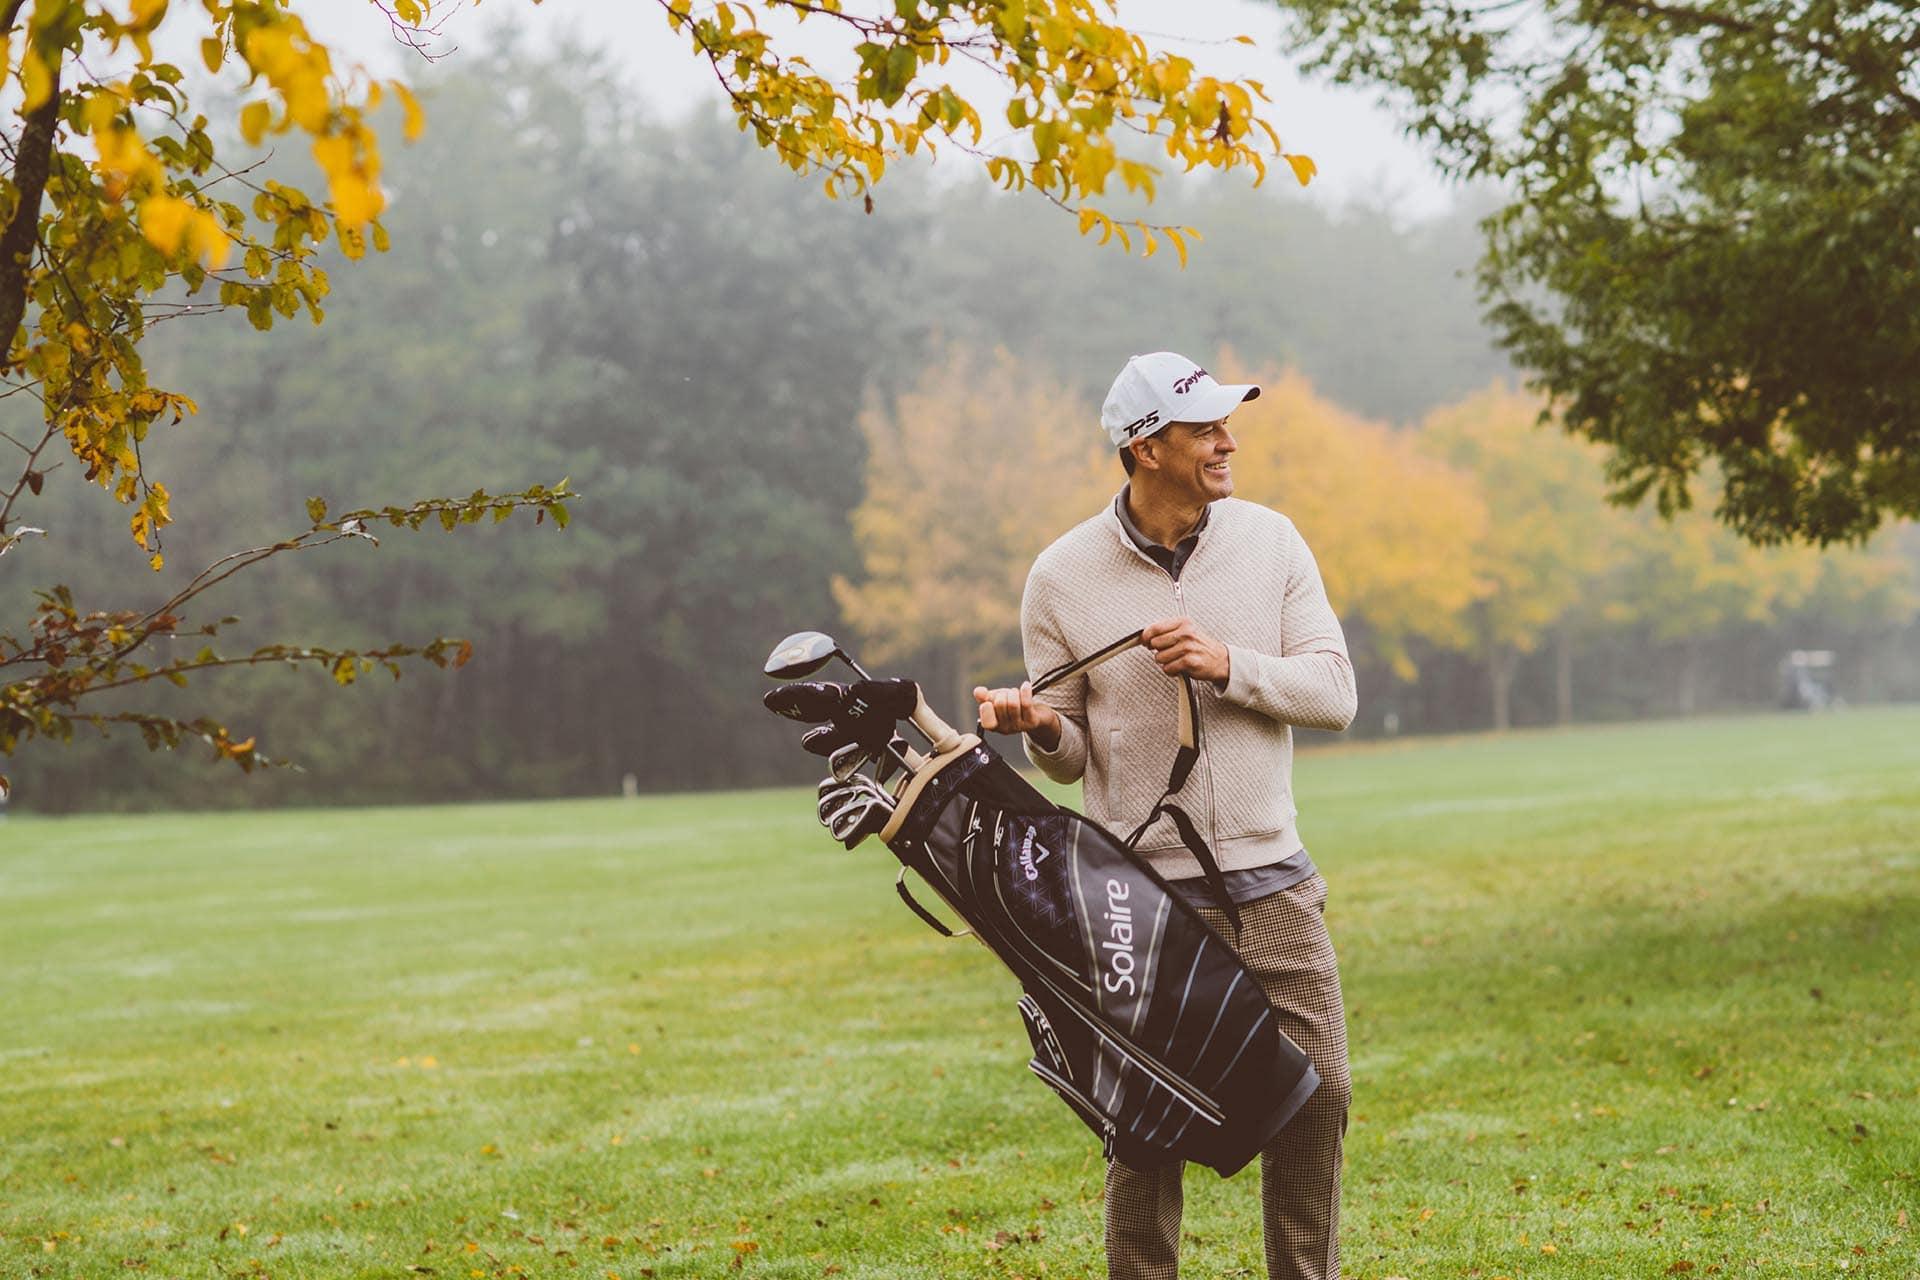 Erlebnis Golf